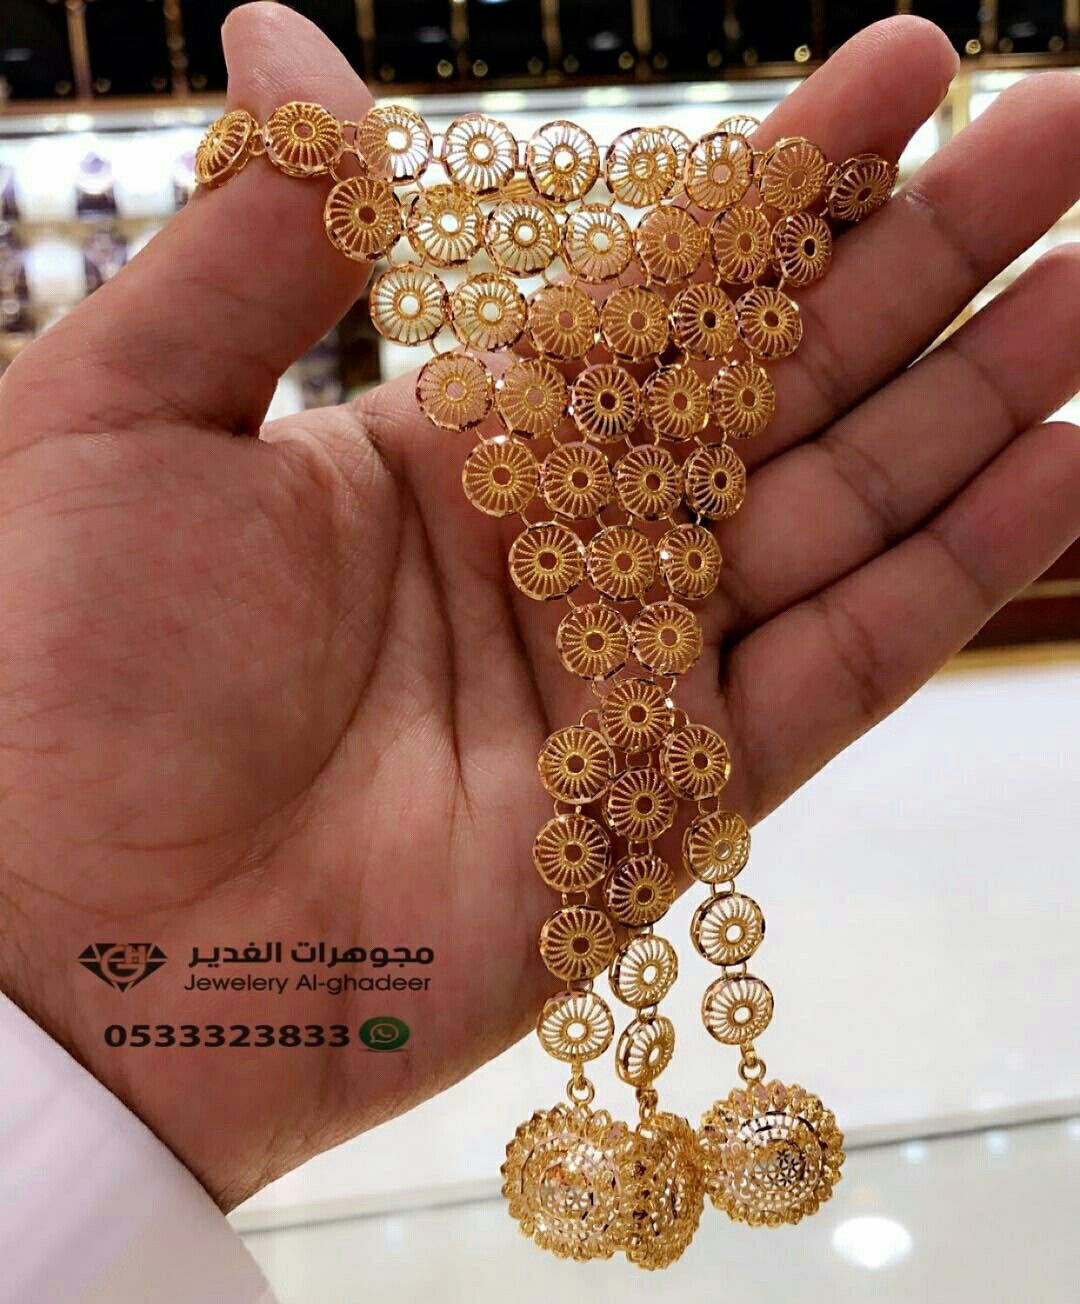 Pin By Tariq On Jewelry Gold Bangles Design Fashion Wedding Jewelry Gold Jewelry Fashion